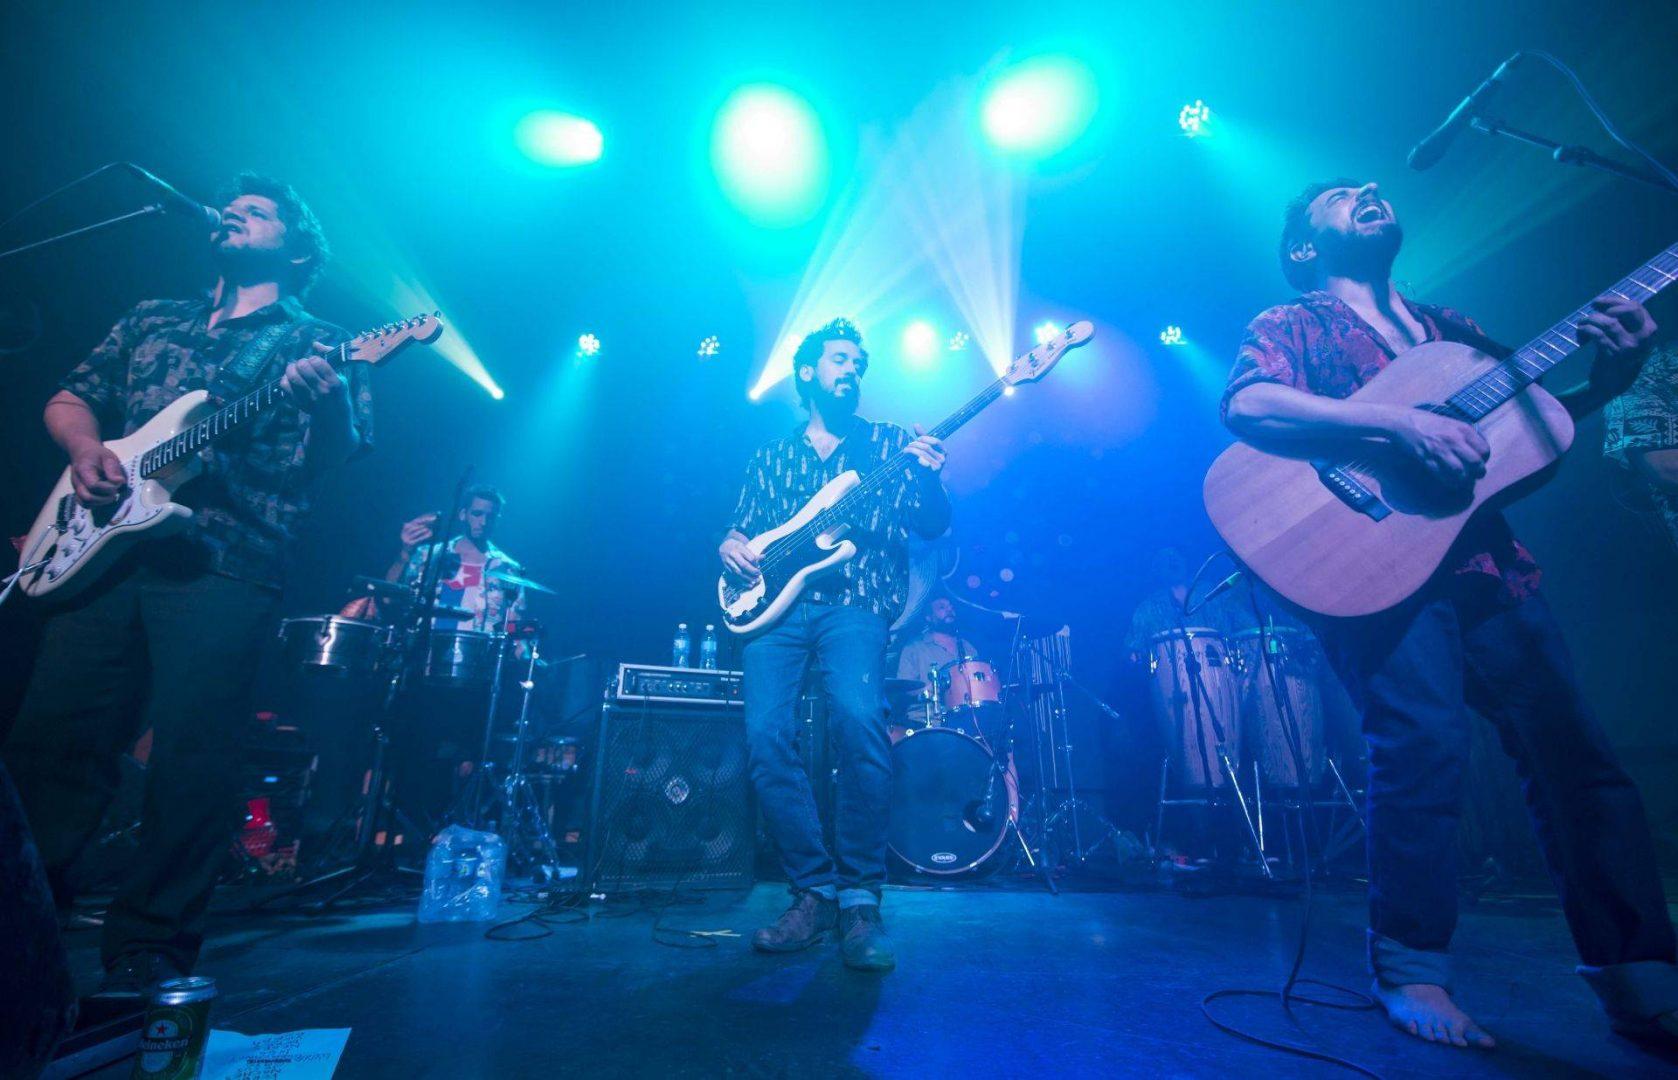 Concert by the Argentine band Los Espíritus at the Cuban Art Factory, November 8, 2018. Photo: Ana Lorena Gamboa.